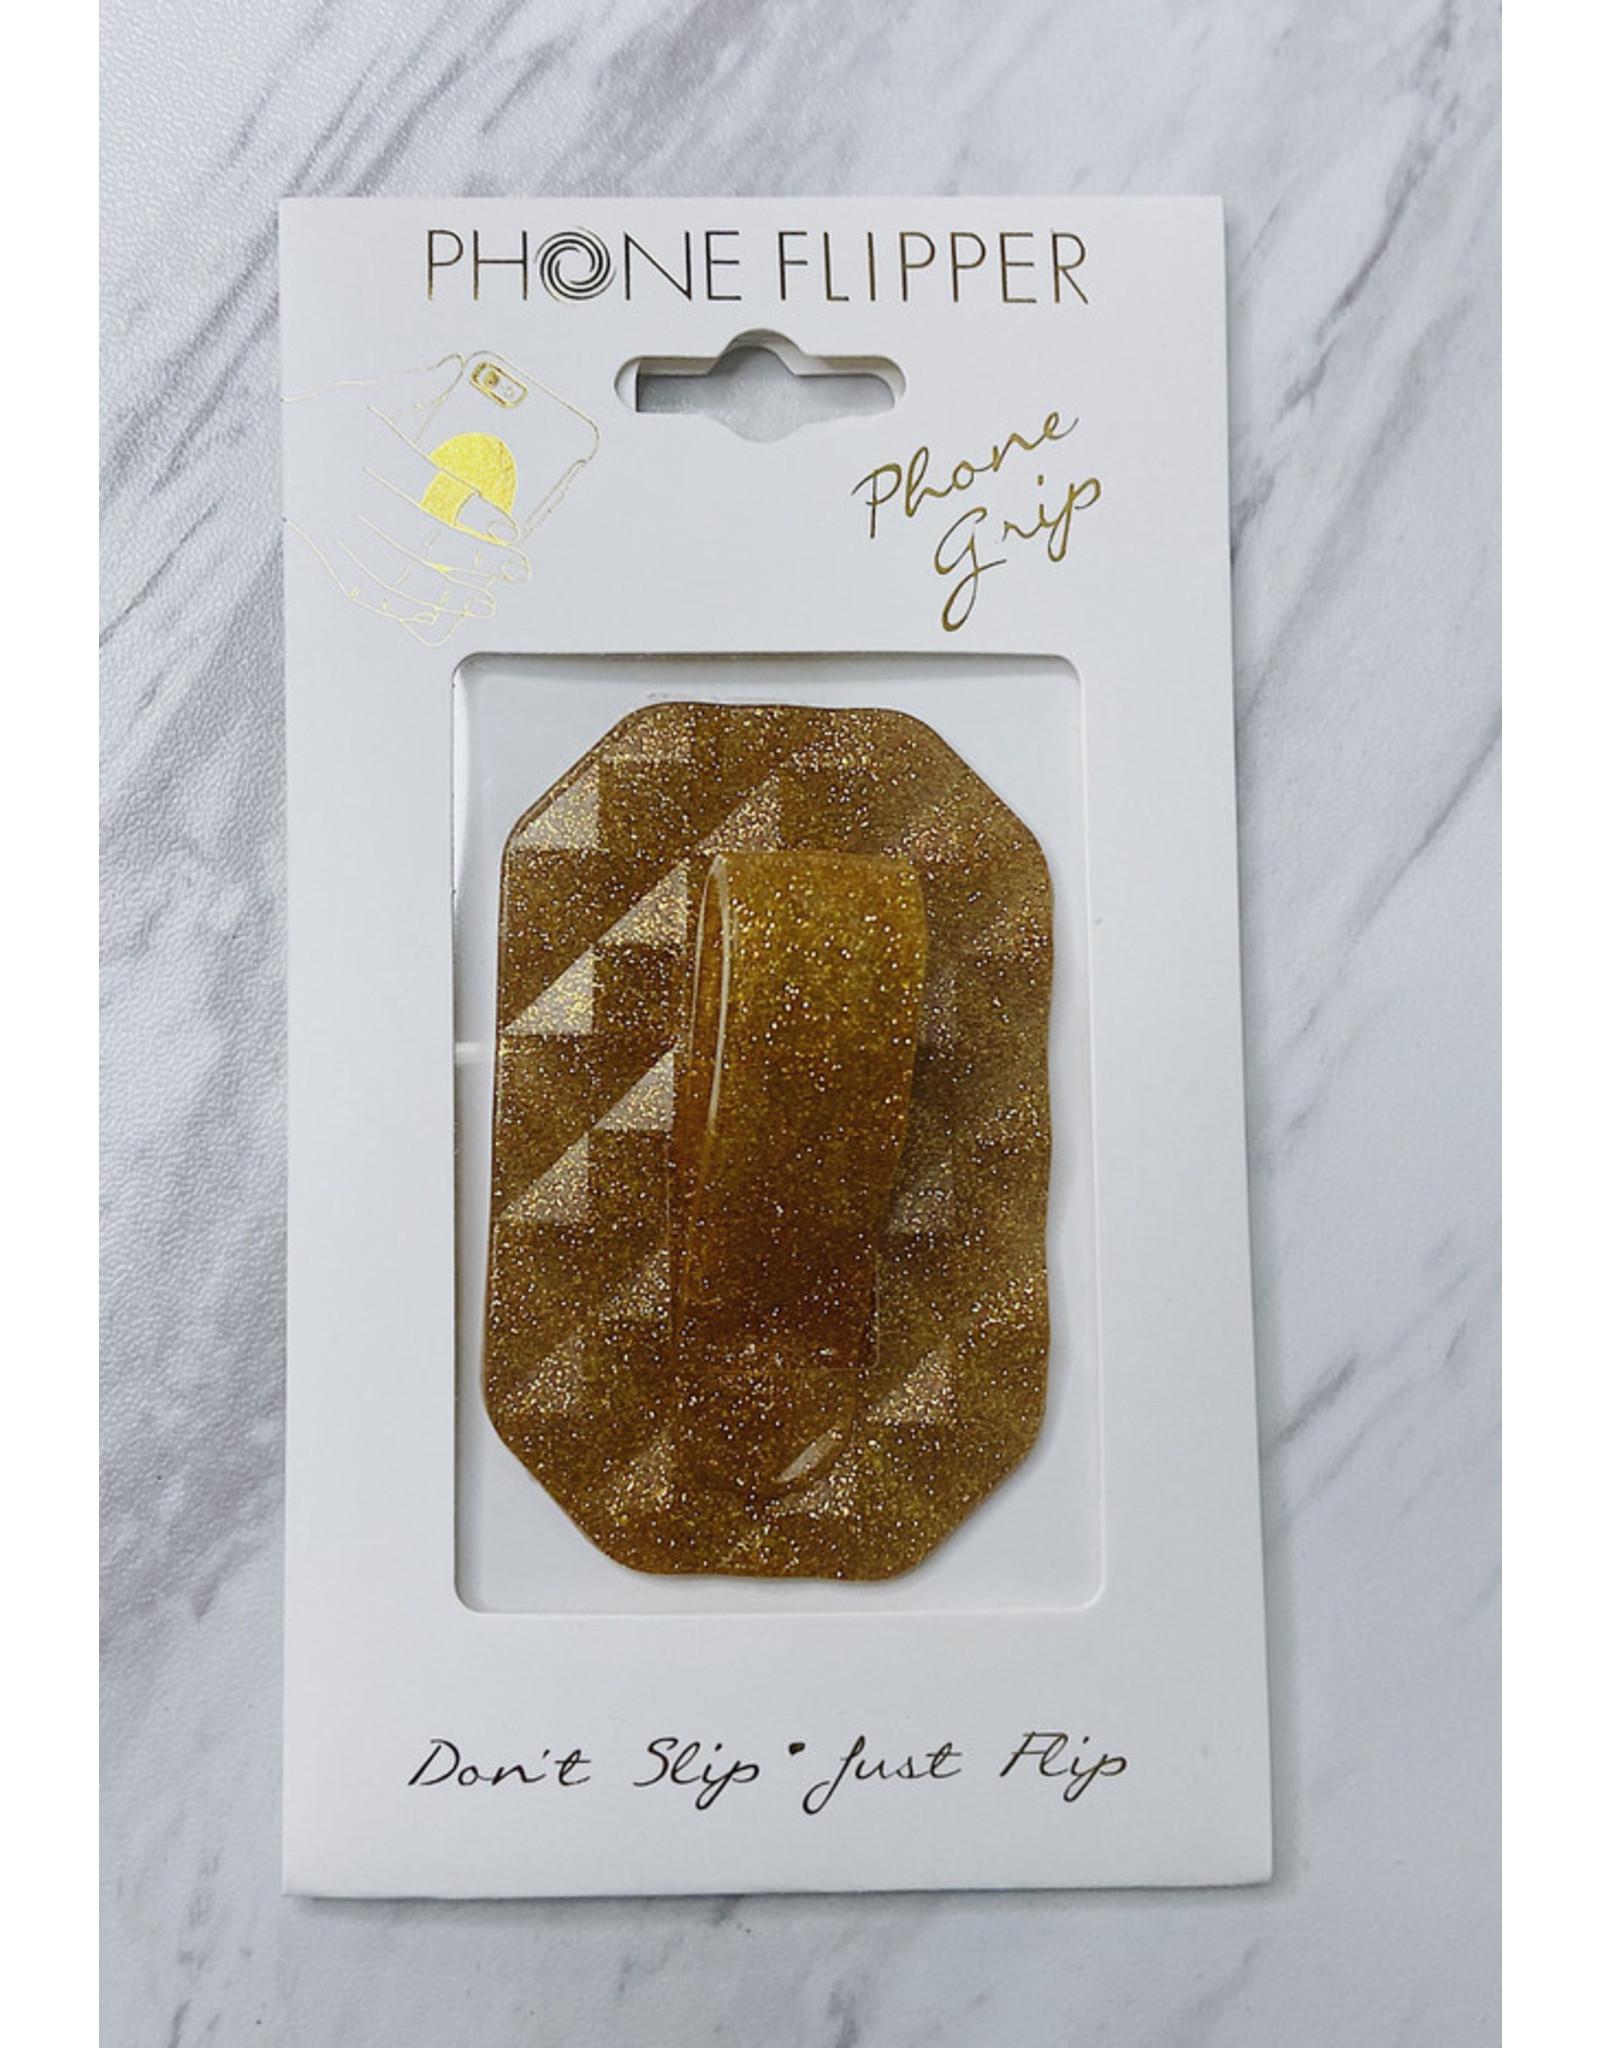 ELWOOD PHONE FLIPPER